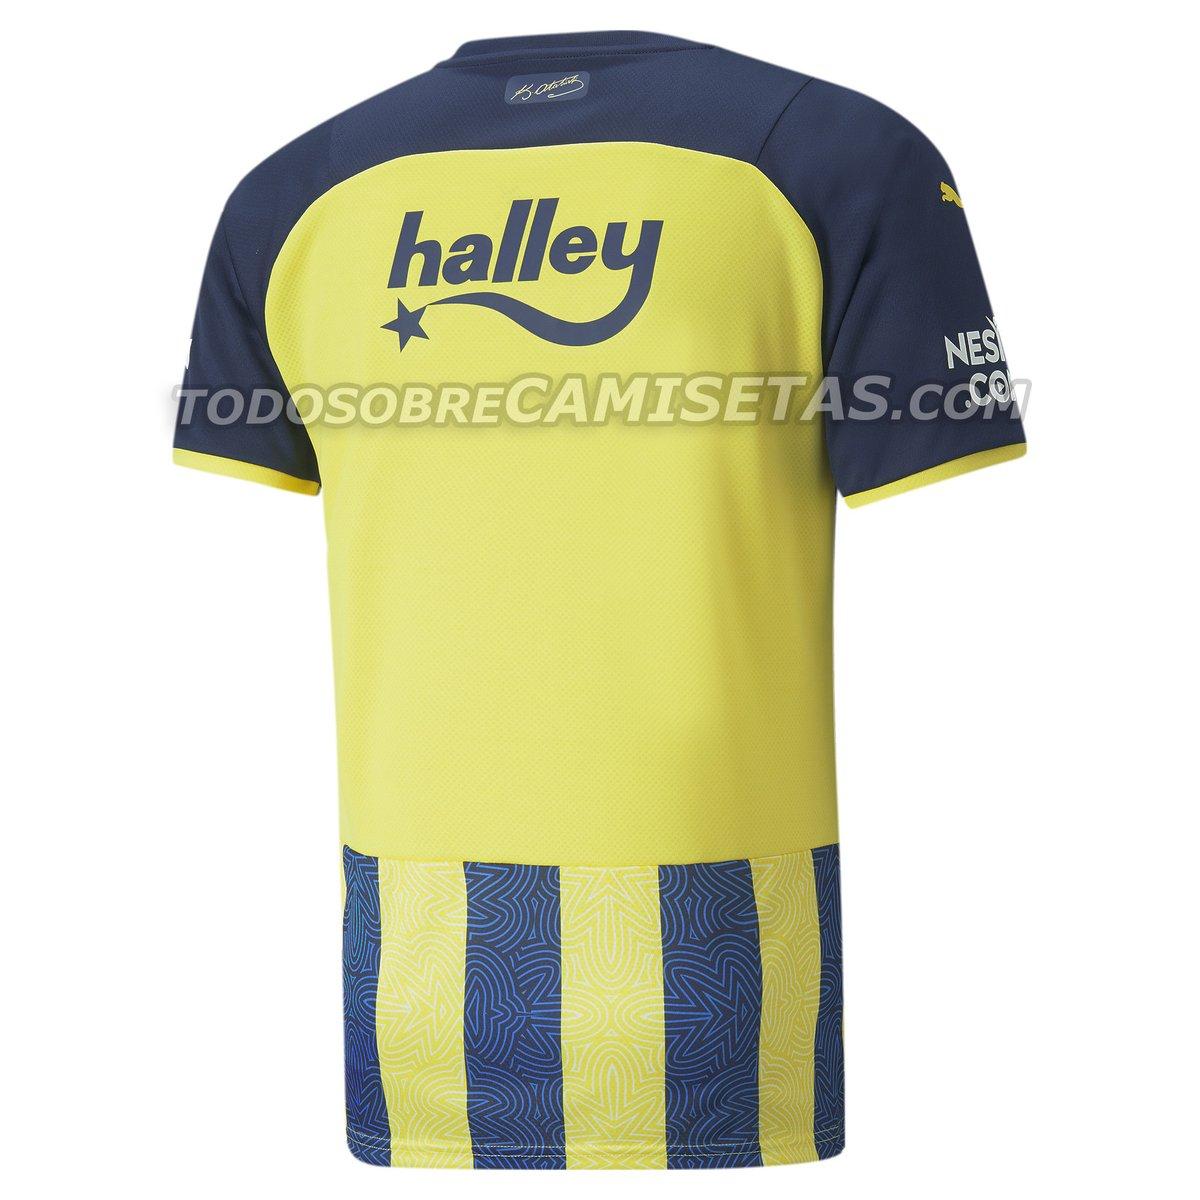 Fenerbahçe SK 2021-22 Kit